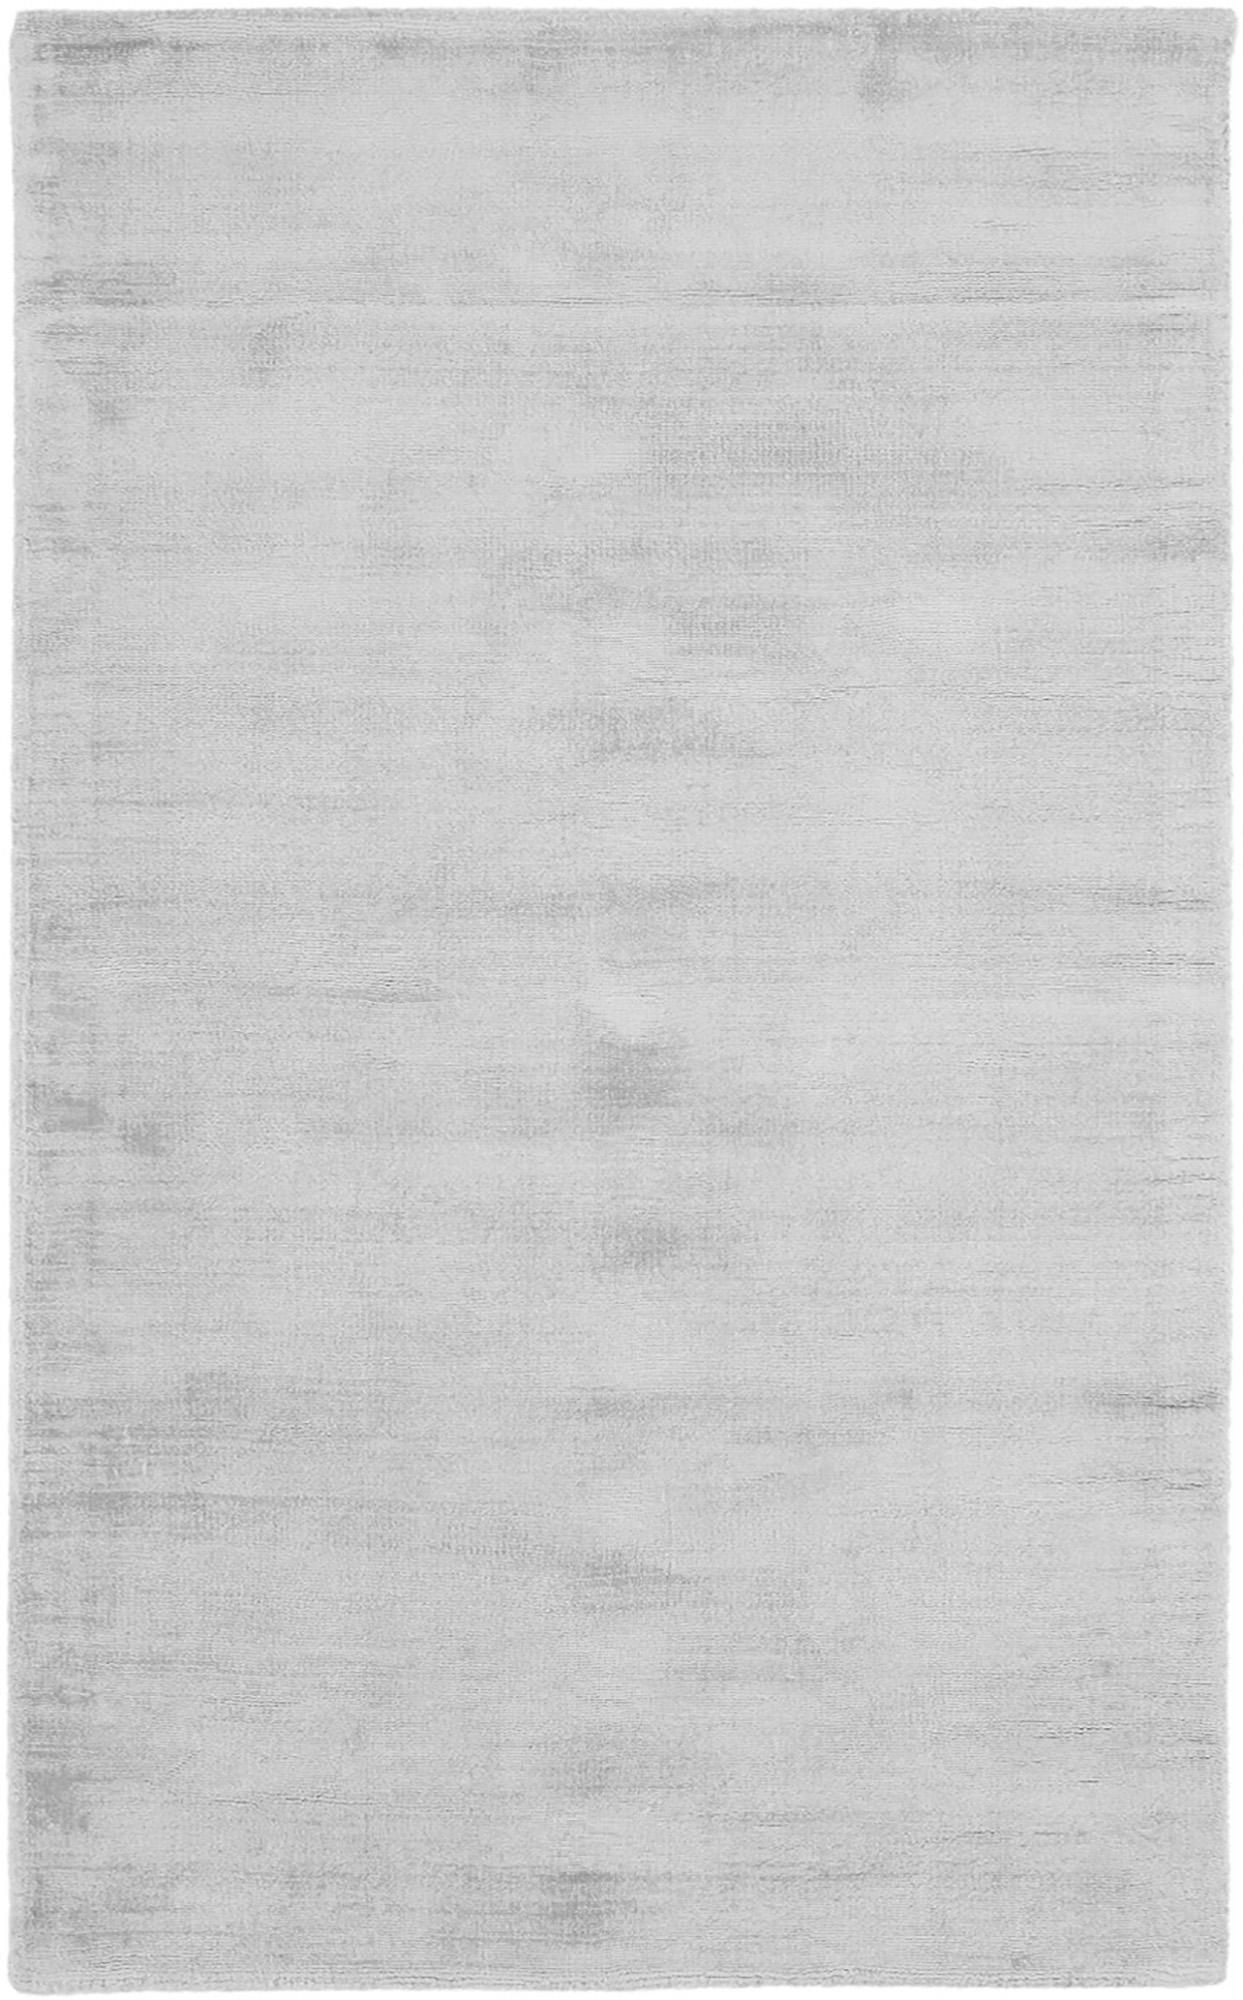 Handgewebter Viskoseteppich Jane in Silbergrau, Flor: 100% Viskose, Silbergrau, B 300 x L 400 cm (Größe XL)